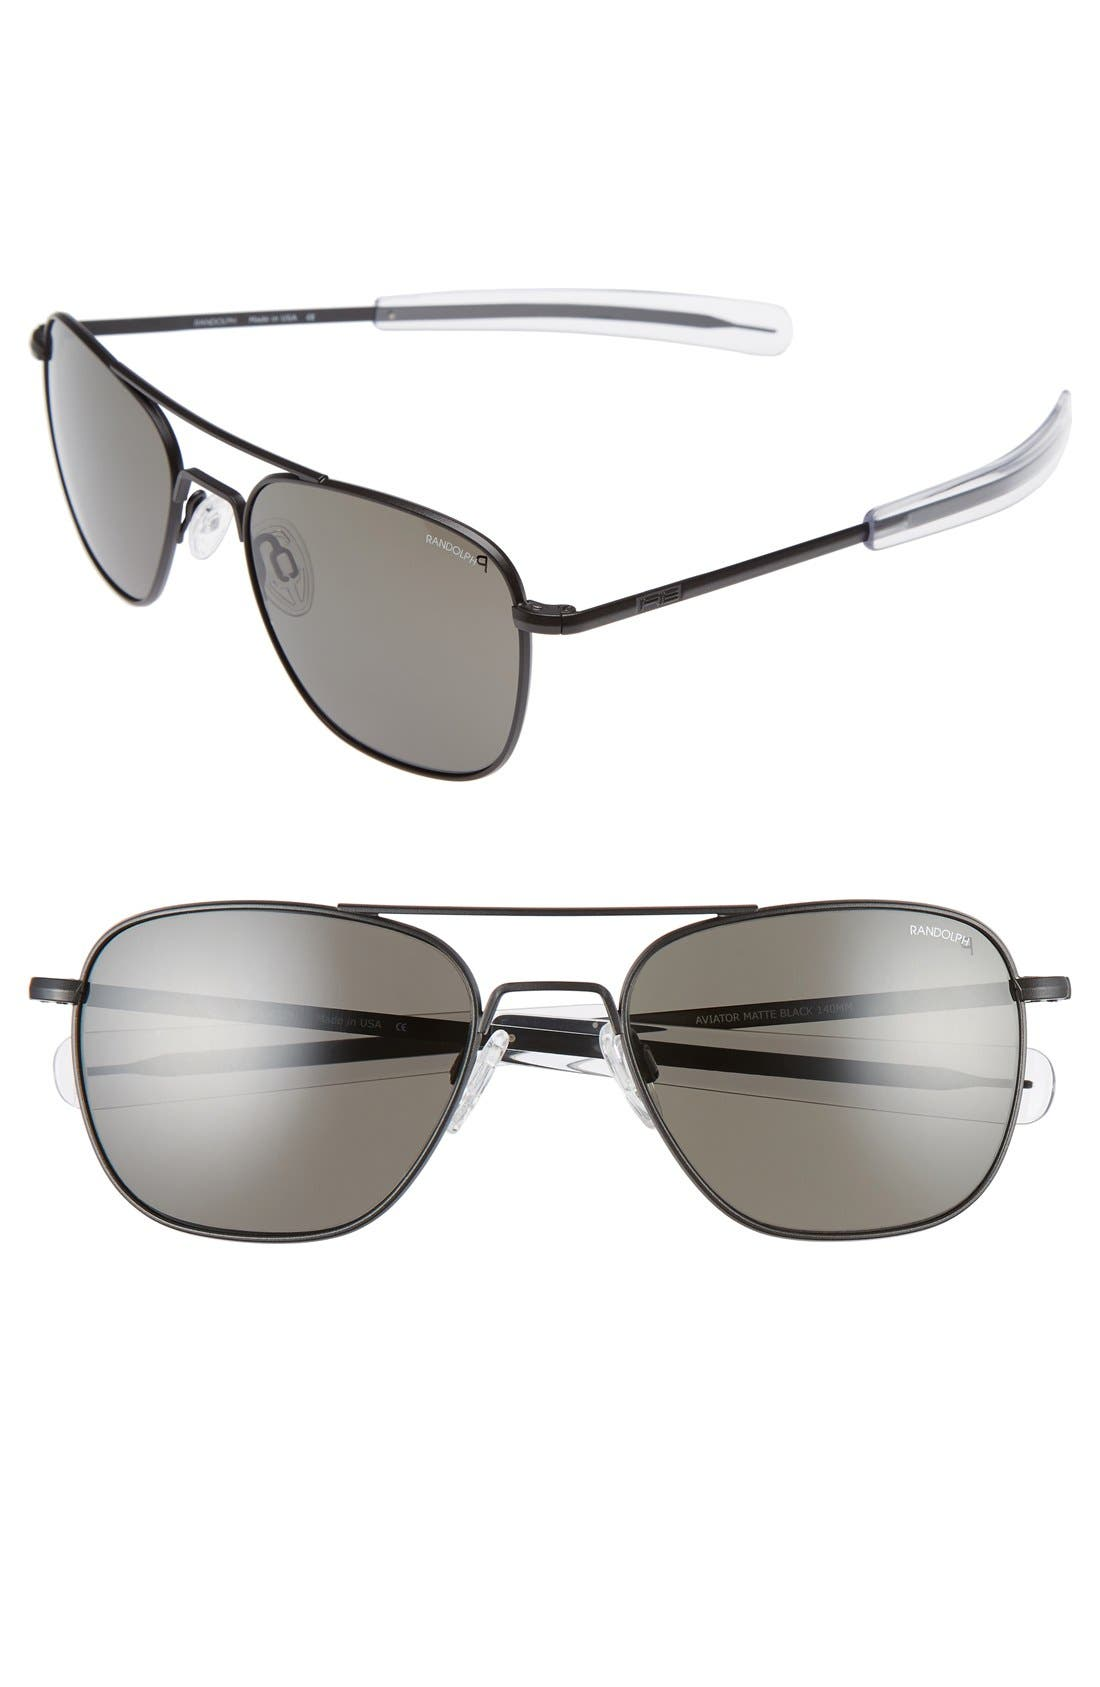 55mm Polarized Aviator Sunglasses,                         Main,                         color, 001